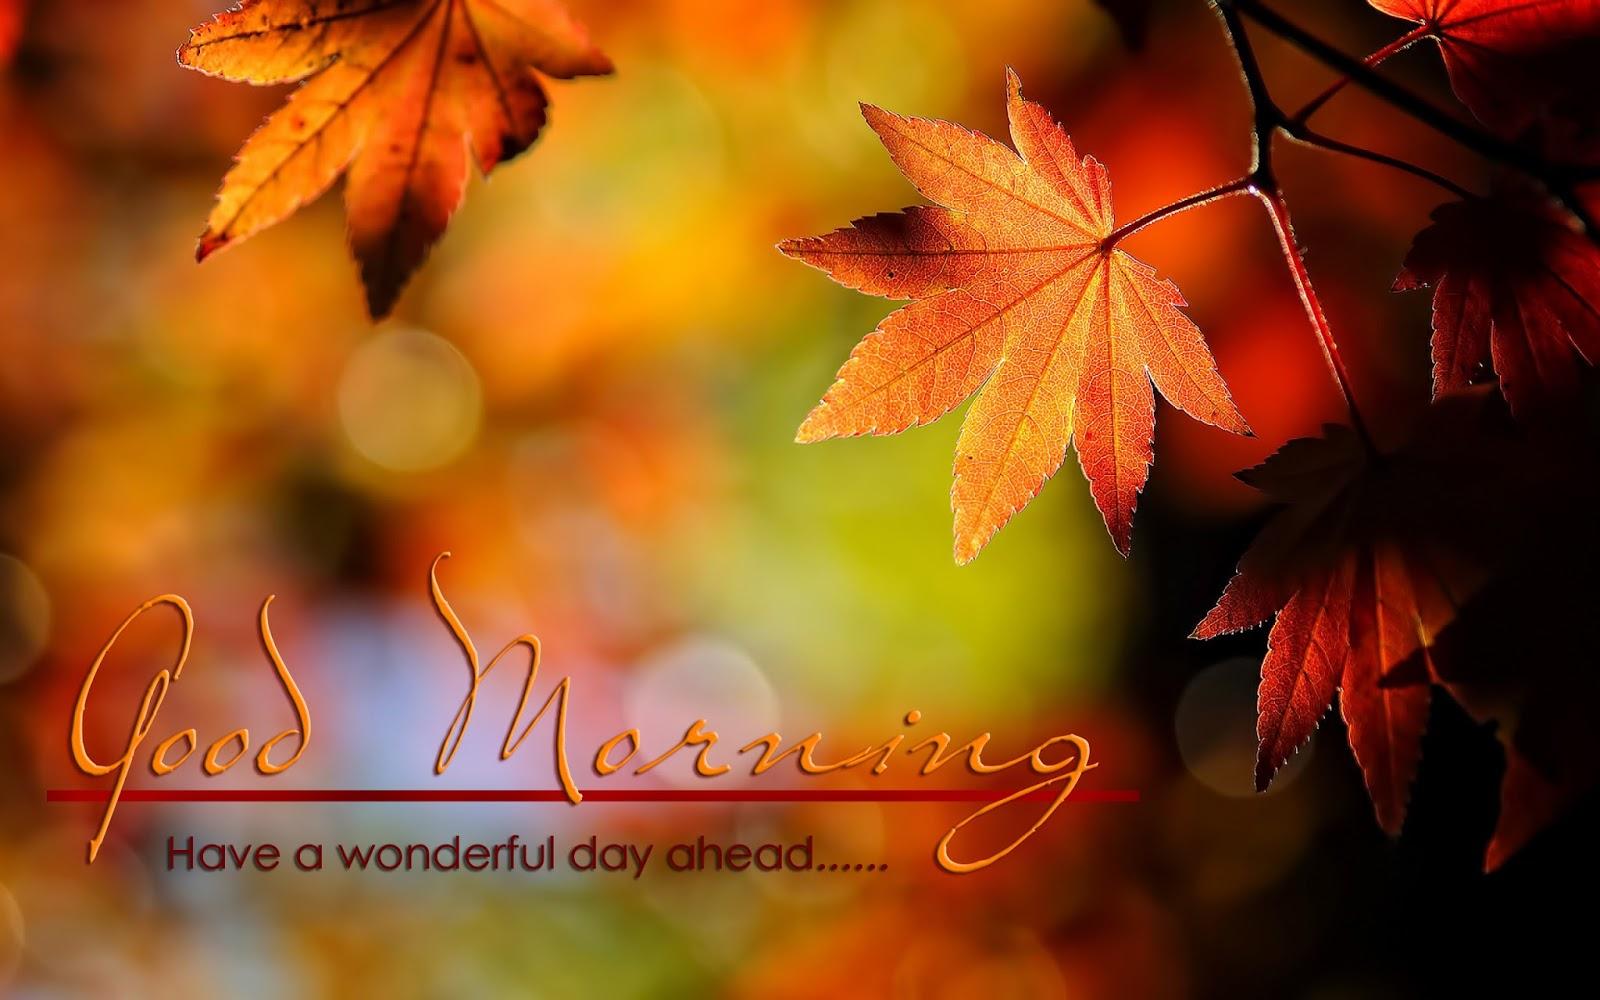 Good Morning Wonderful day HD Wallpaper